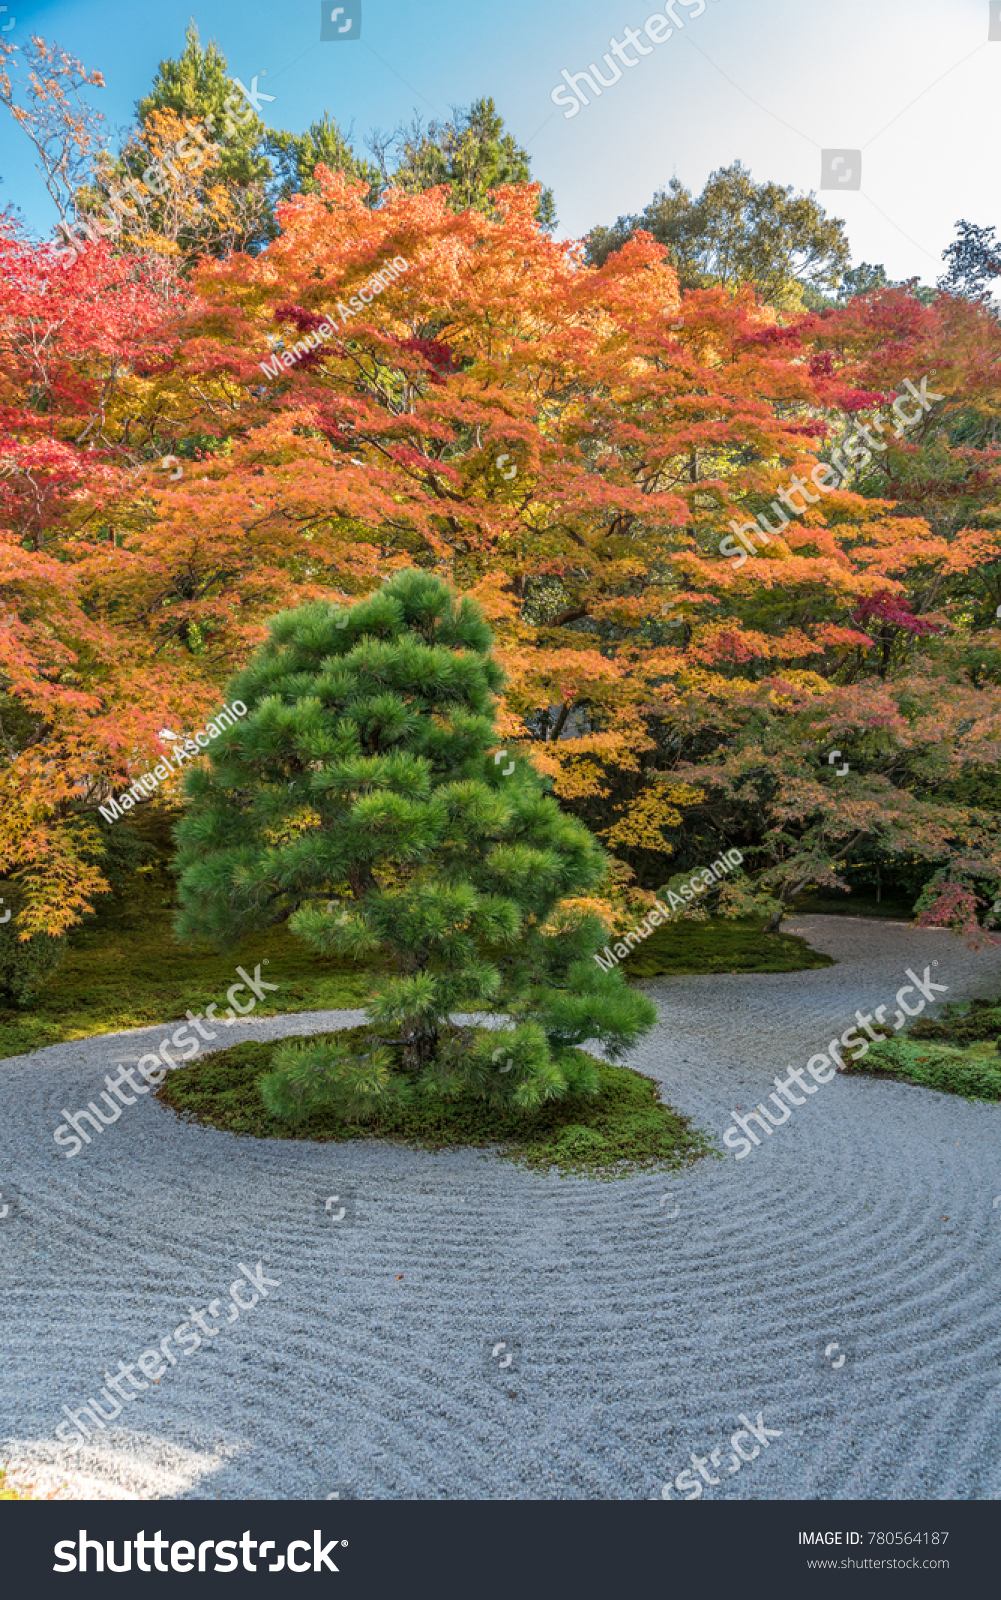 Autumn Leaves Fall Foliage Tenjuan Temple Stock Photo (Royalty Free ...